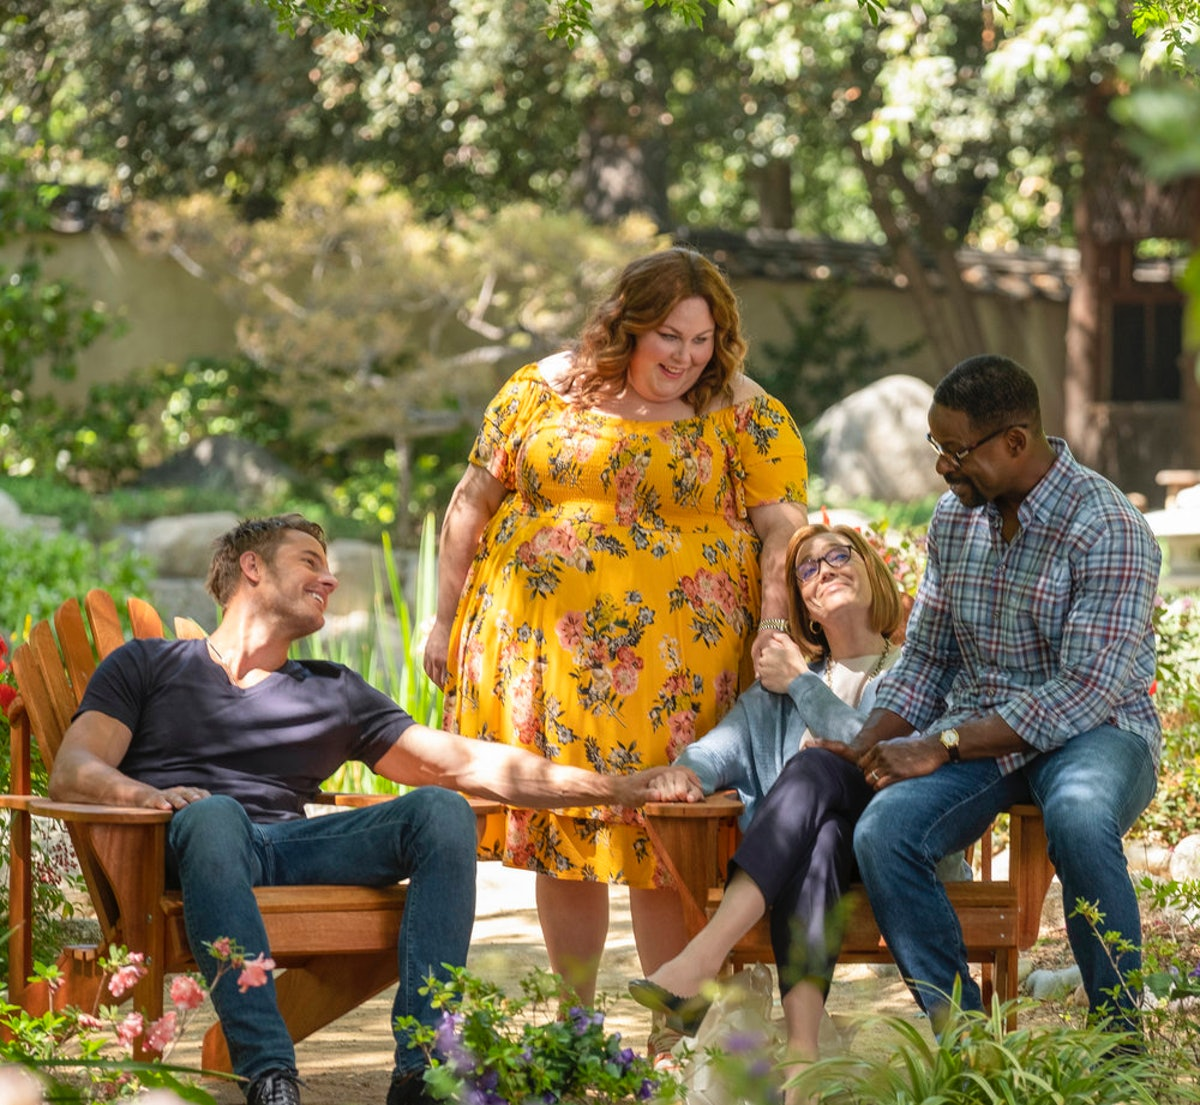 Justin Hartley as Kevin, Chrissy Metz as Kate, Mandy Moore as Rebecca, Sterling K. Brown as Randall in 'This Is Us'